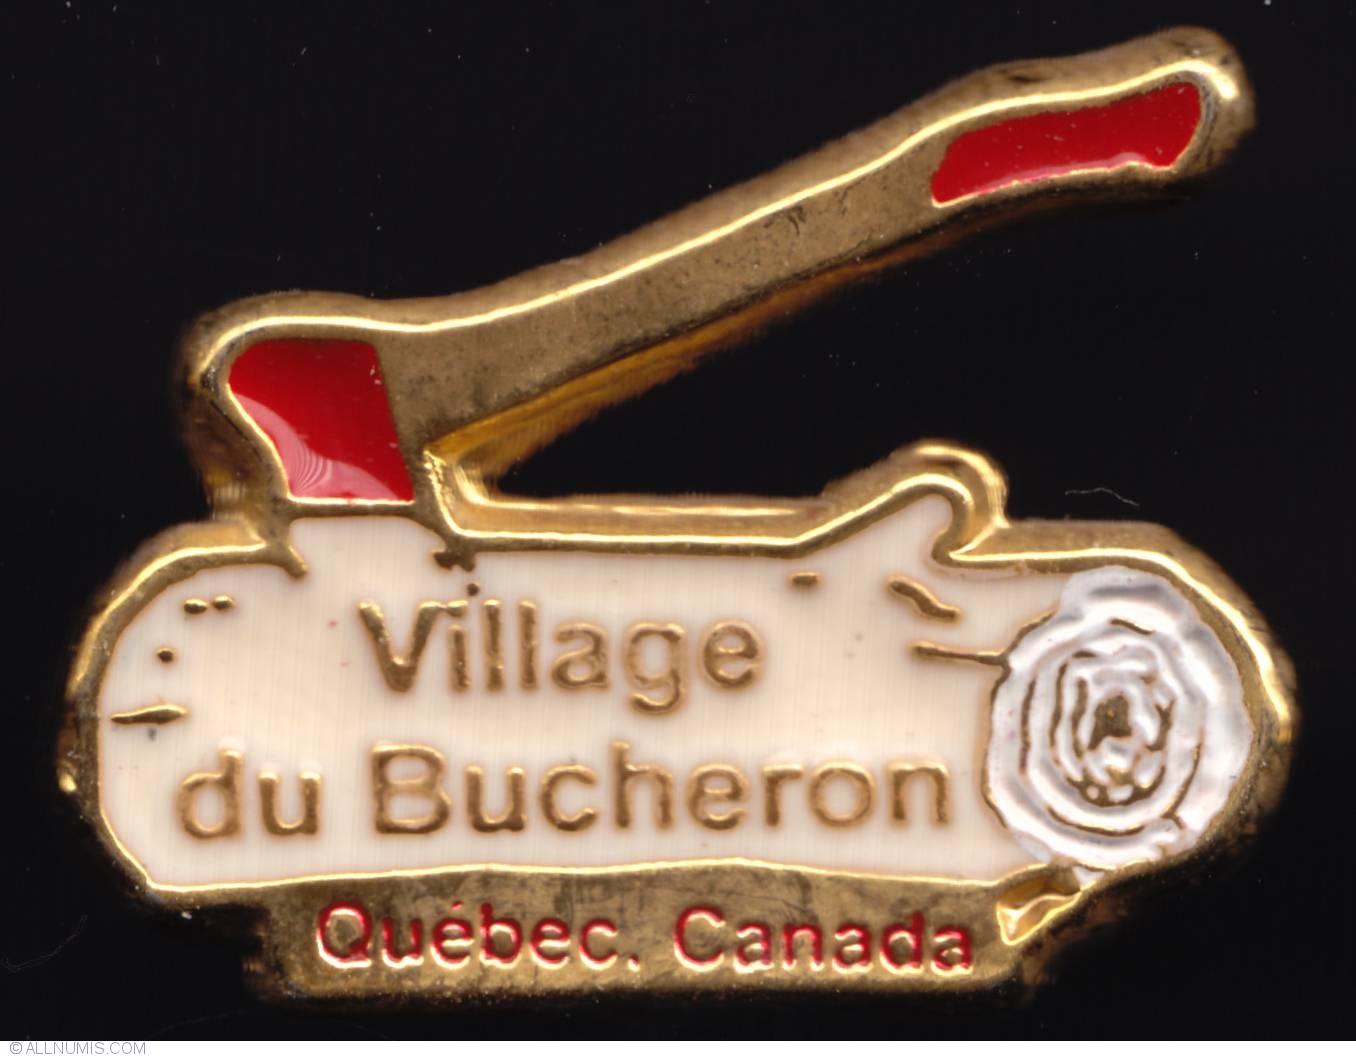 grandes-piles-village-du-bucheron_1189_352894000646defL.jpg